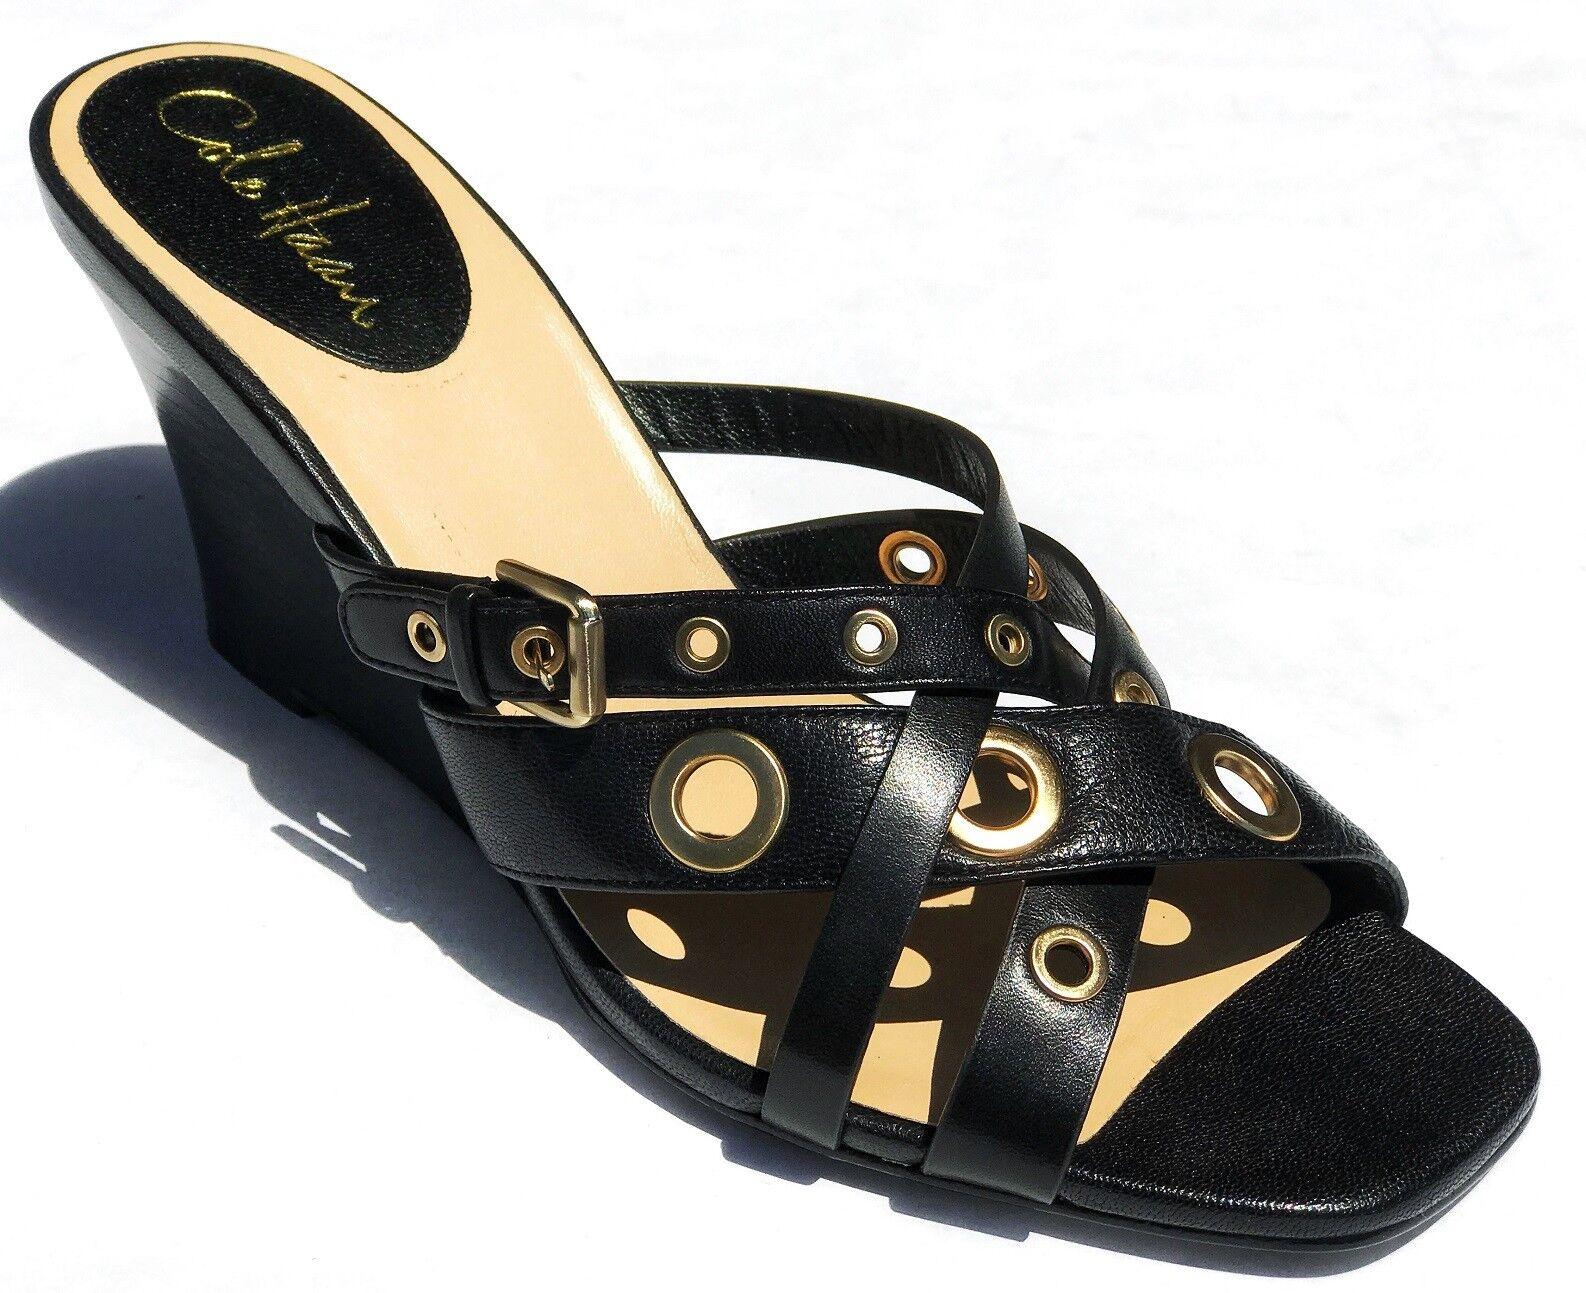 Cole Haan donna Air Whitney Slide Wedge Sandals scarpe nero  10 NEW IN BOX  economico